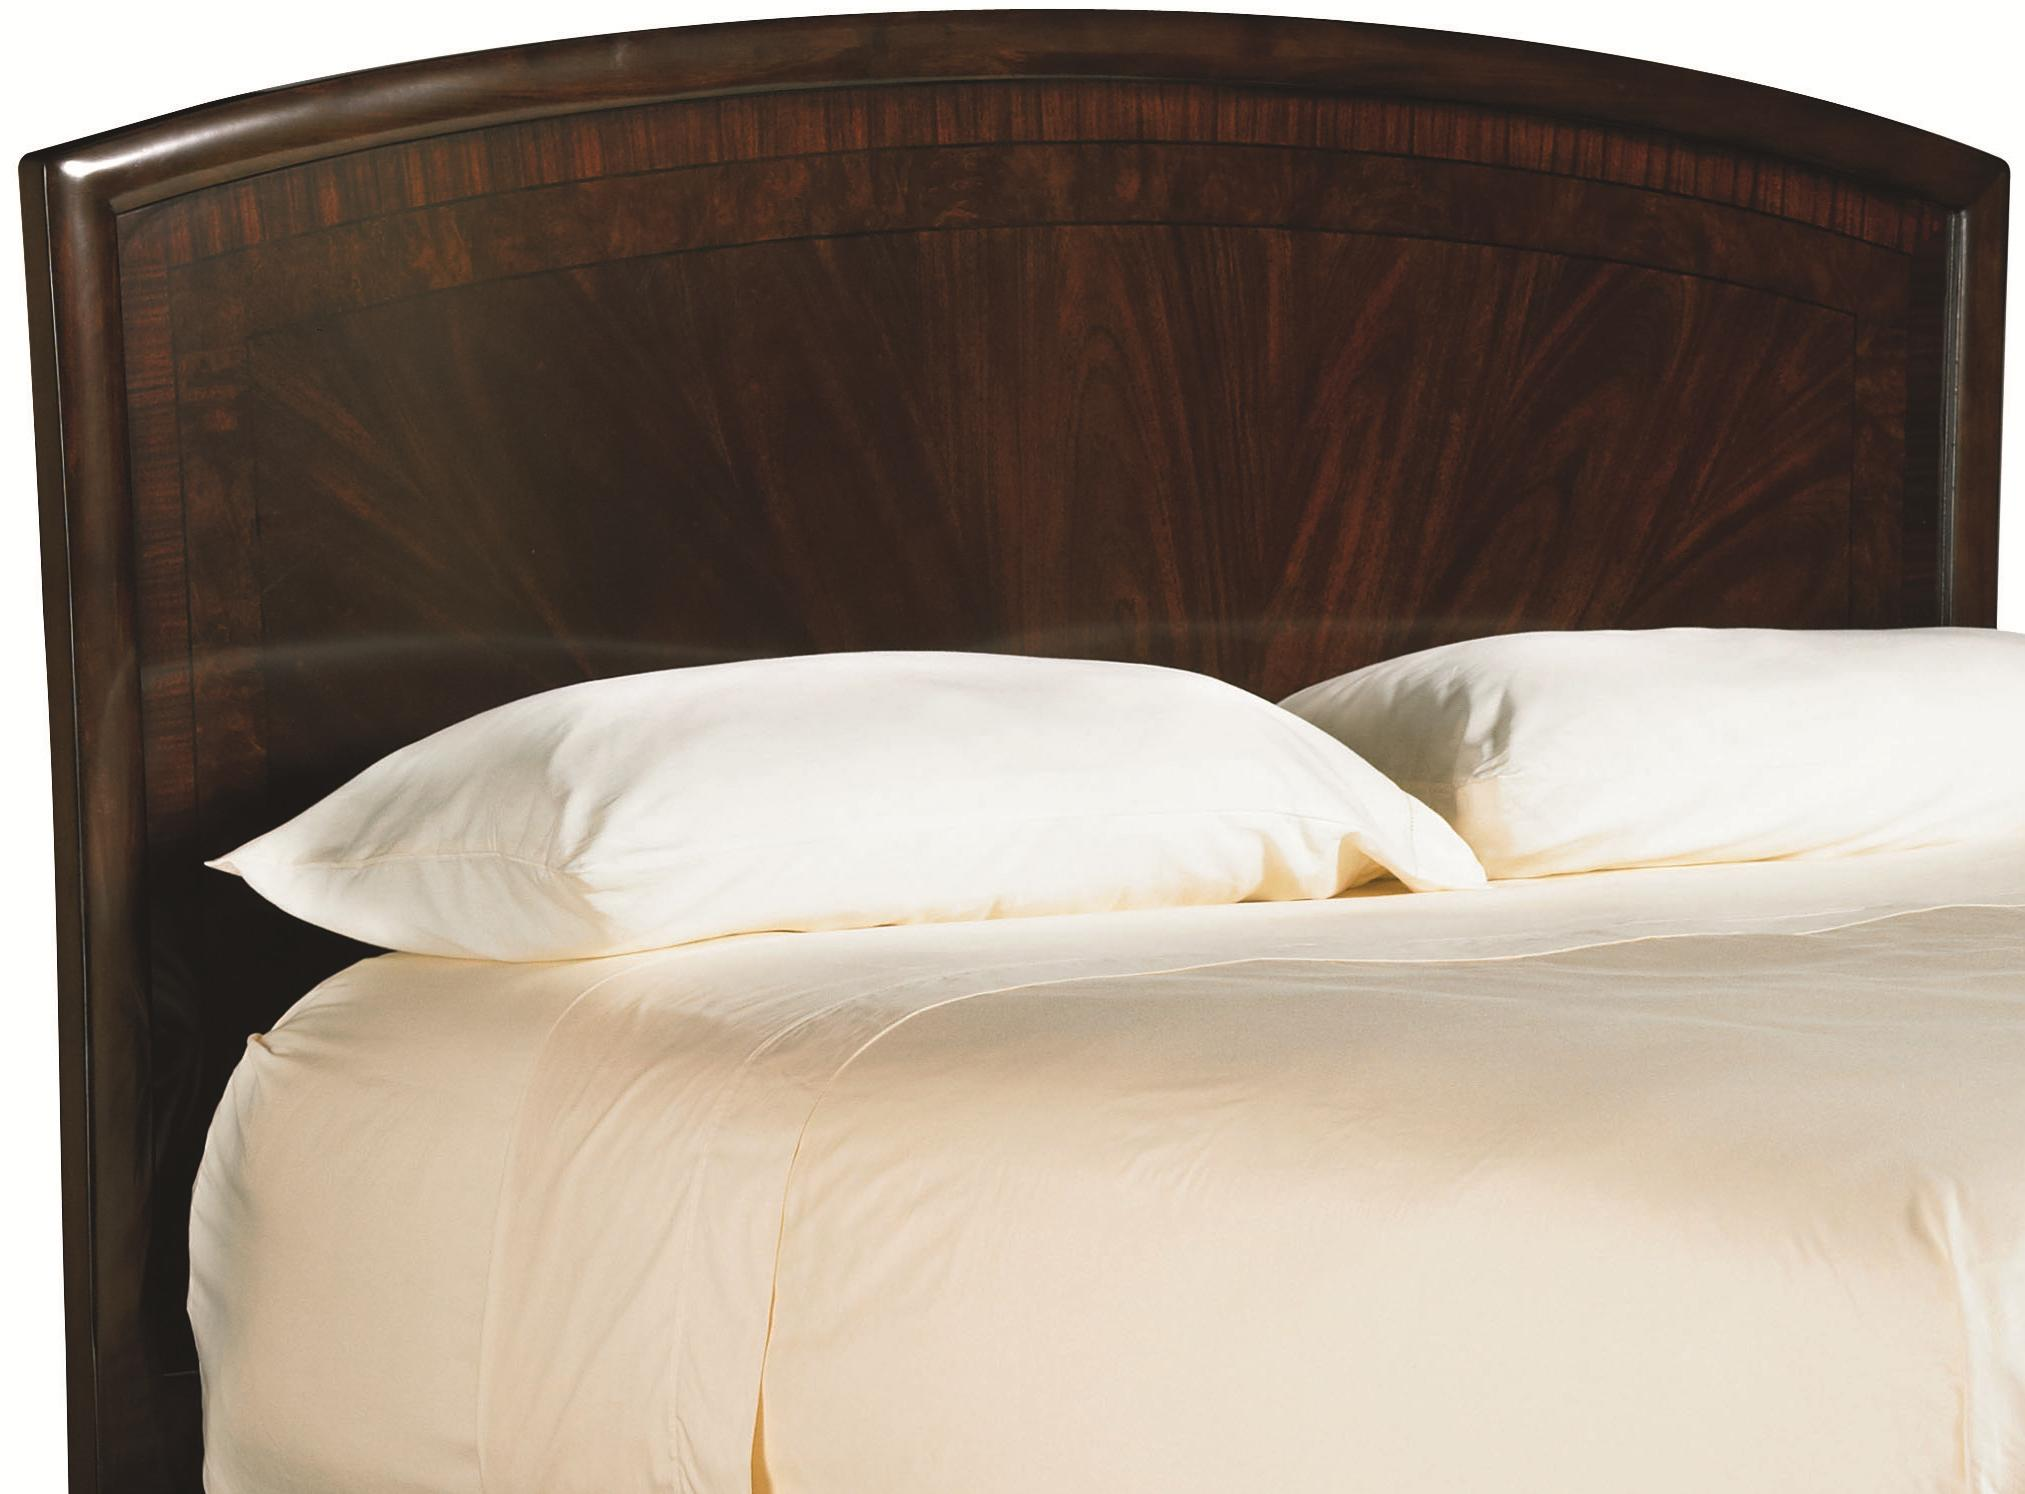 Thomasville® Spellbound Queen Panel Headboard - Item Number: 82211-415